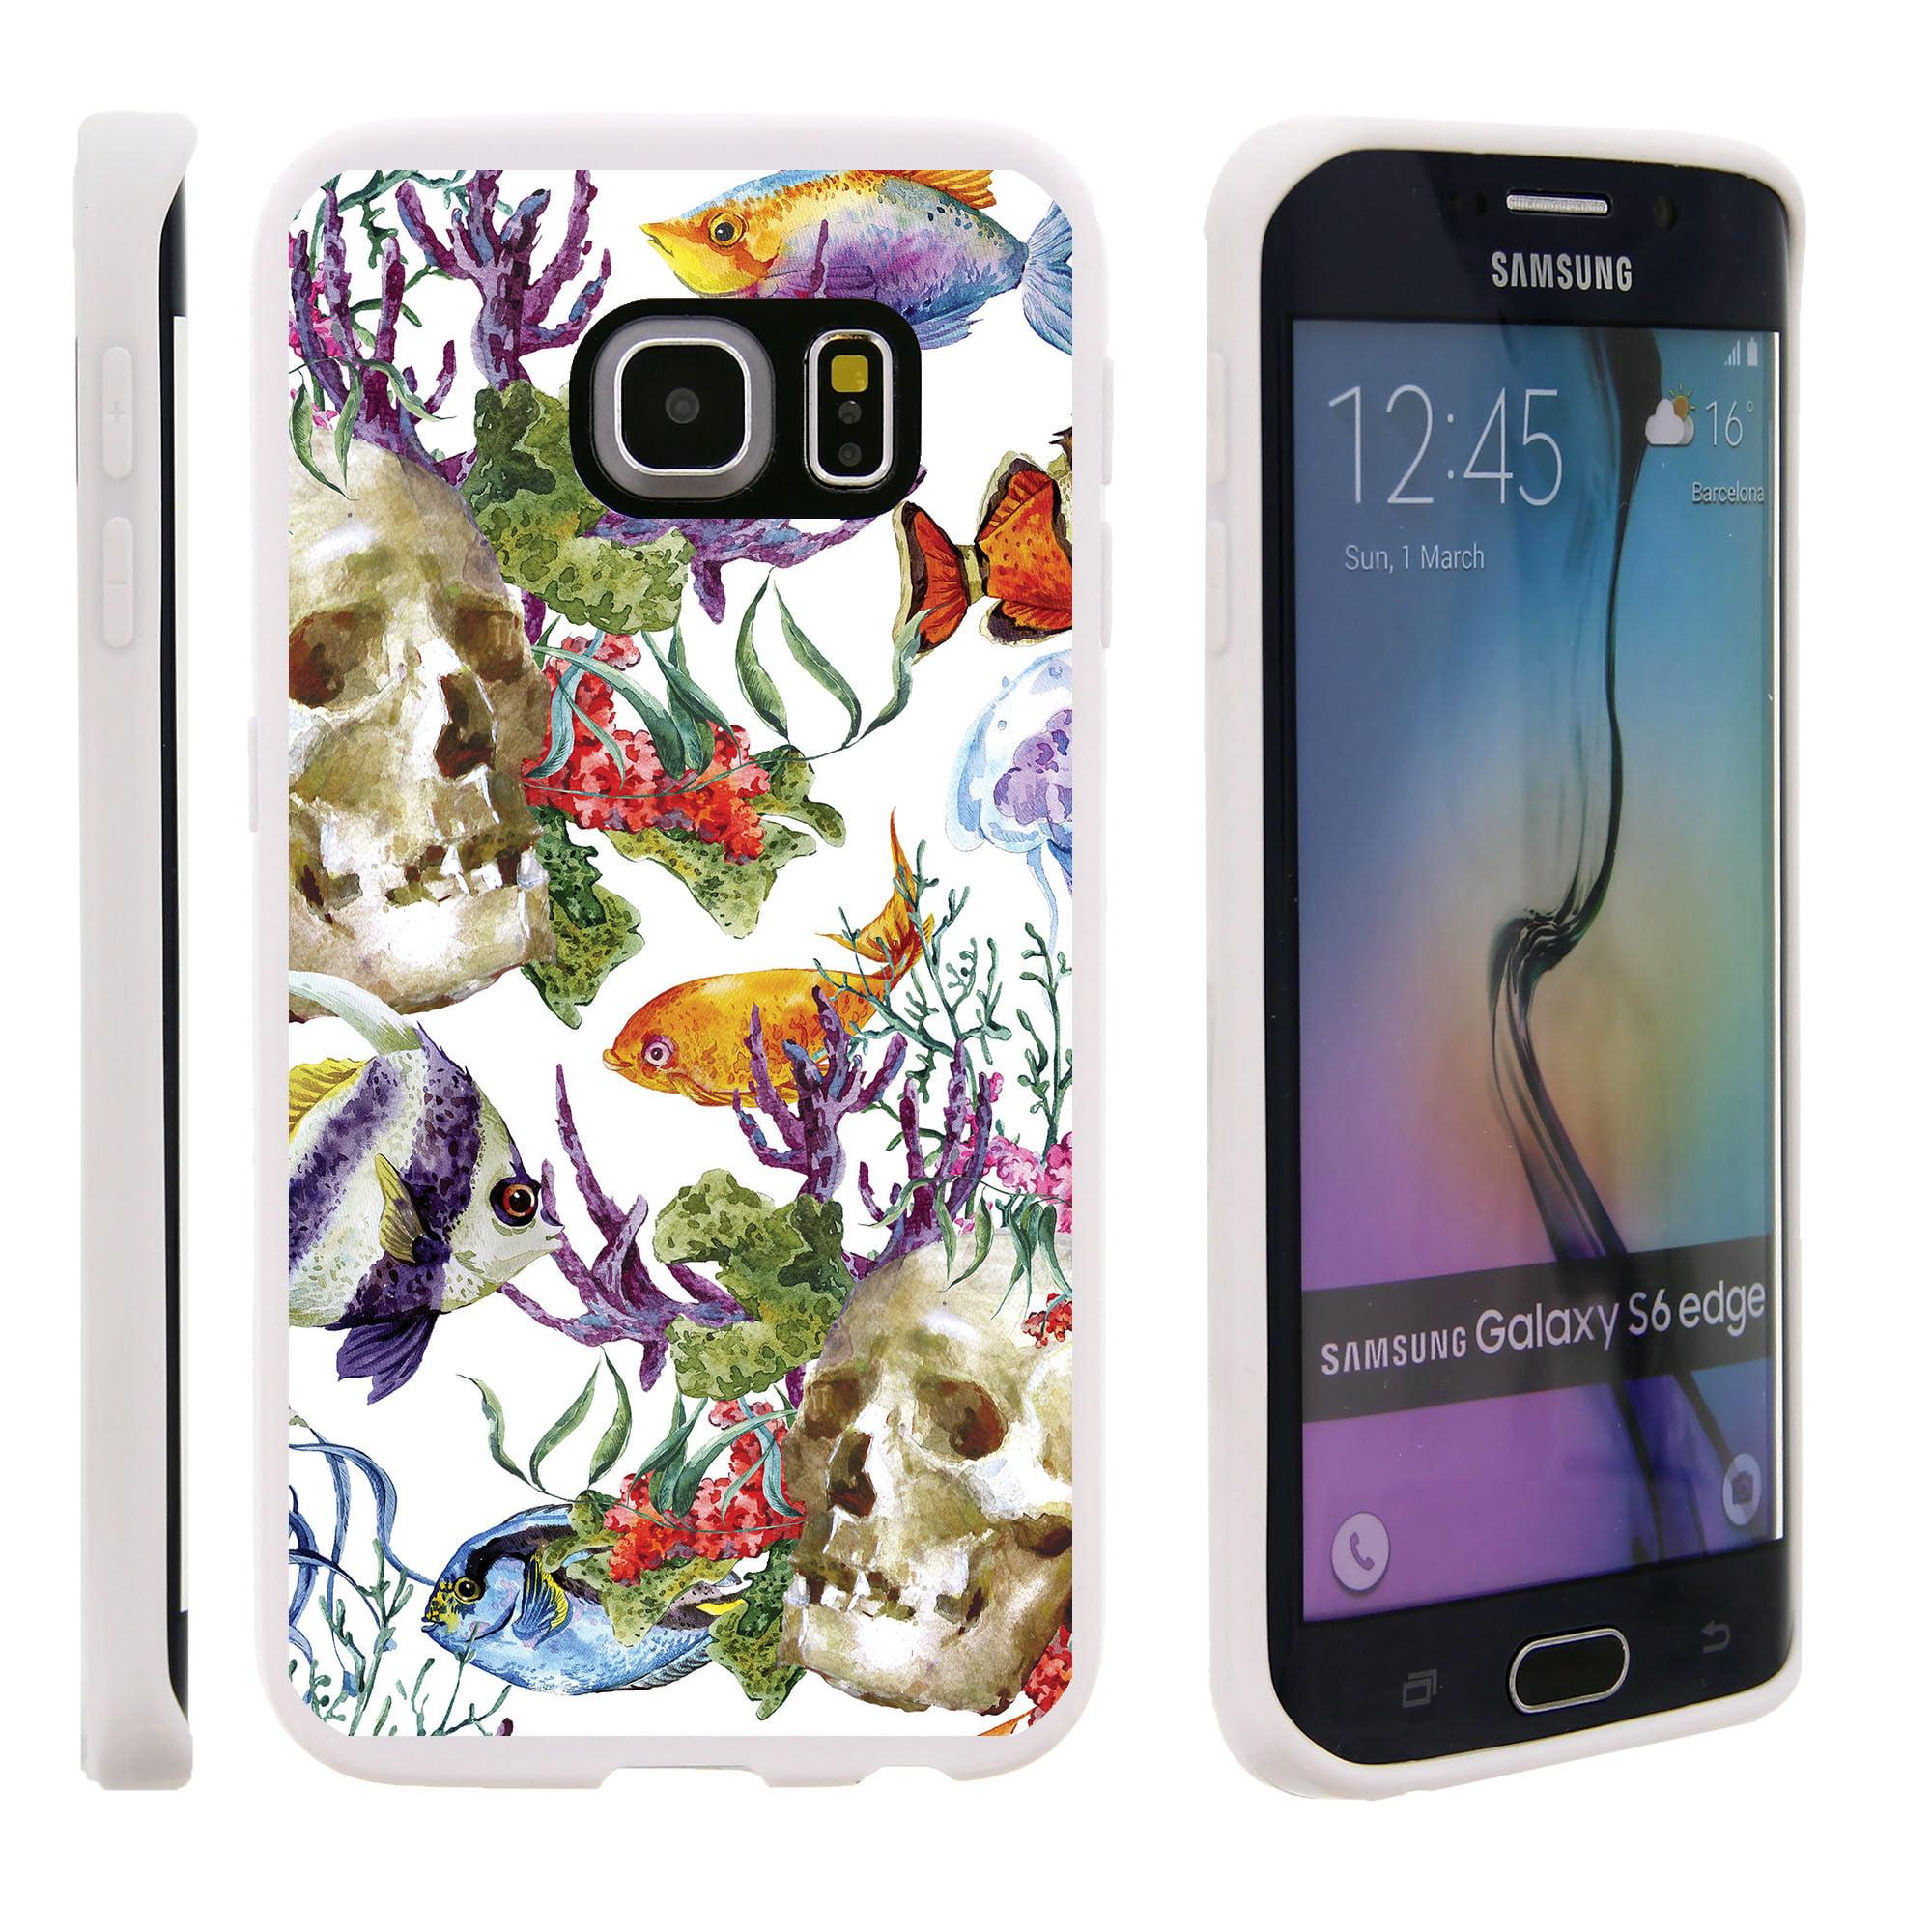 Samsung Galaxy S6 Edge G925, Flexible Case [FLEX FORCE] Slim Durable TPU Sleek Bumper with Unique Designs - Fish and Skulls